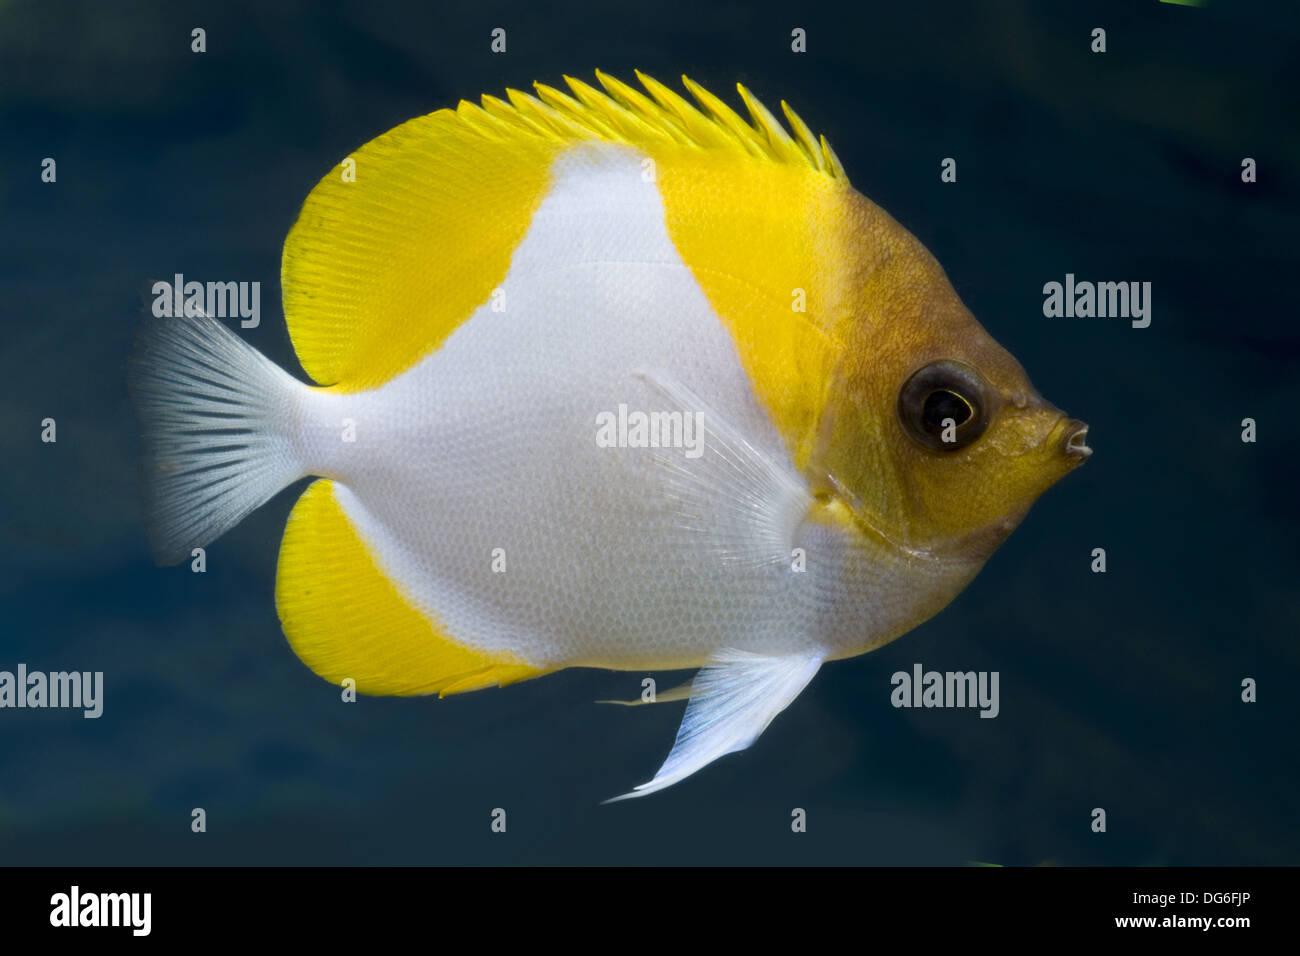 pyramid butterflyfish, hemitaurichthys polylepis - Stock Image